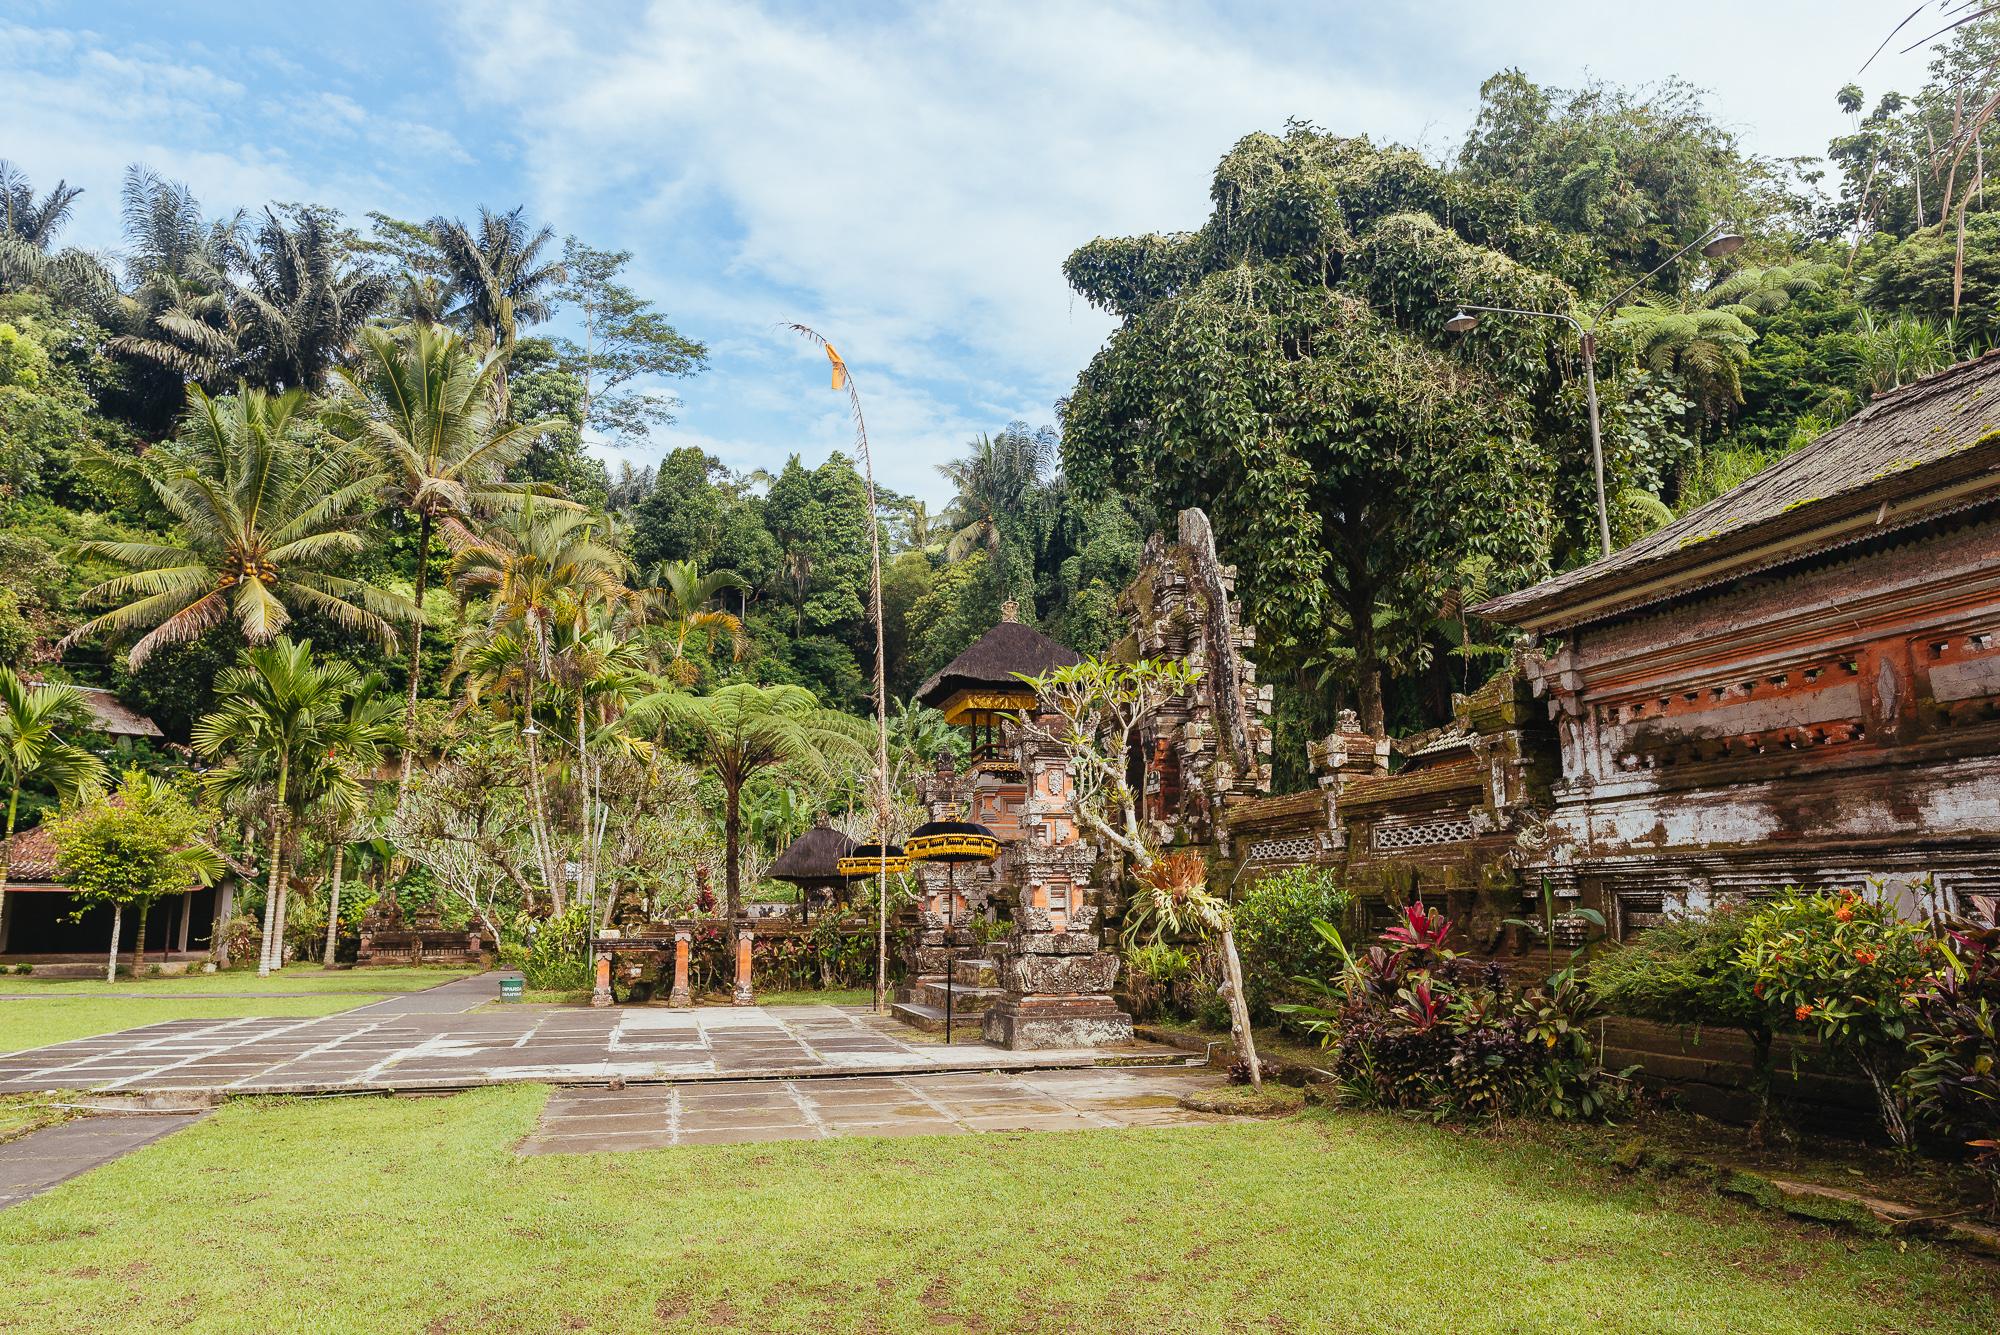 indonesia_2017-356.jpg